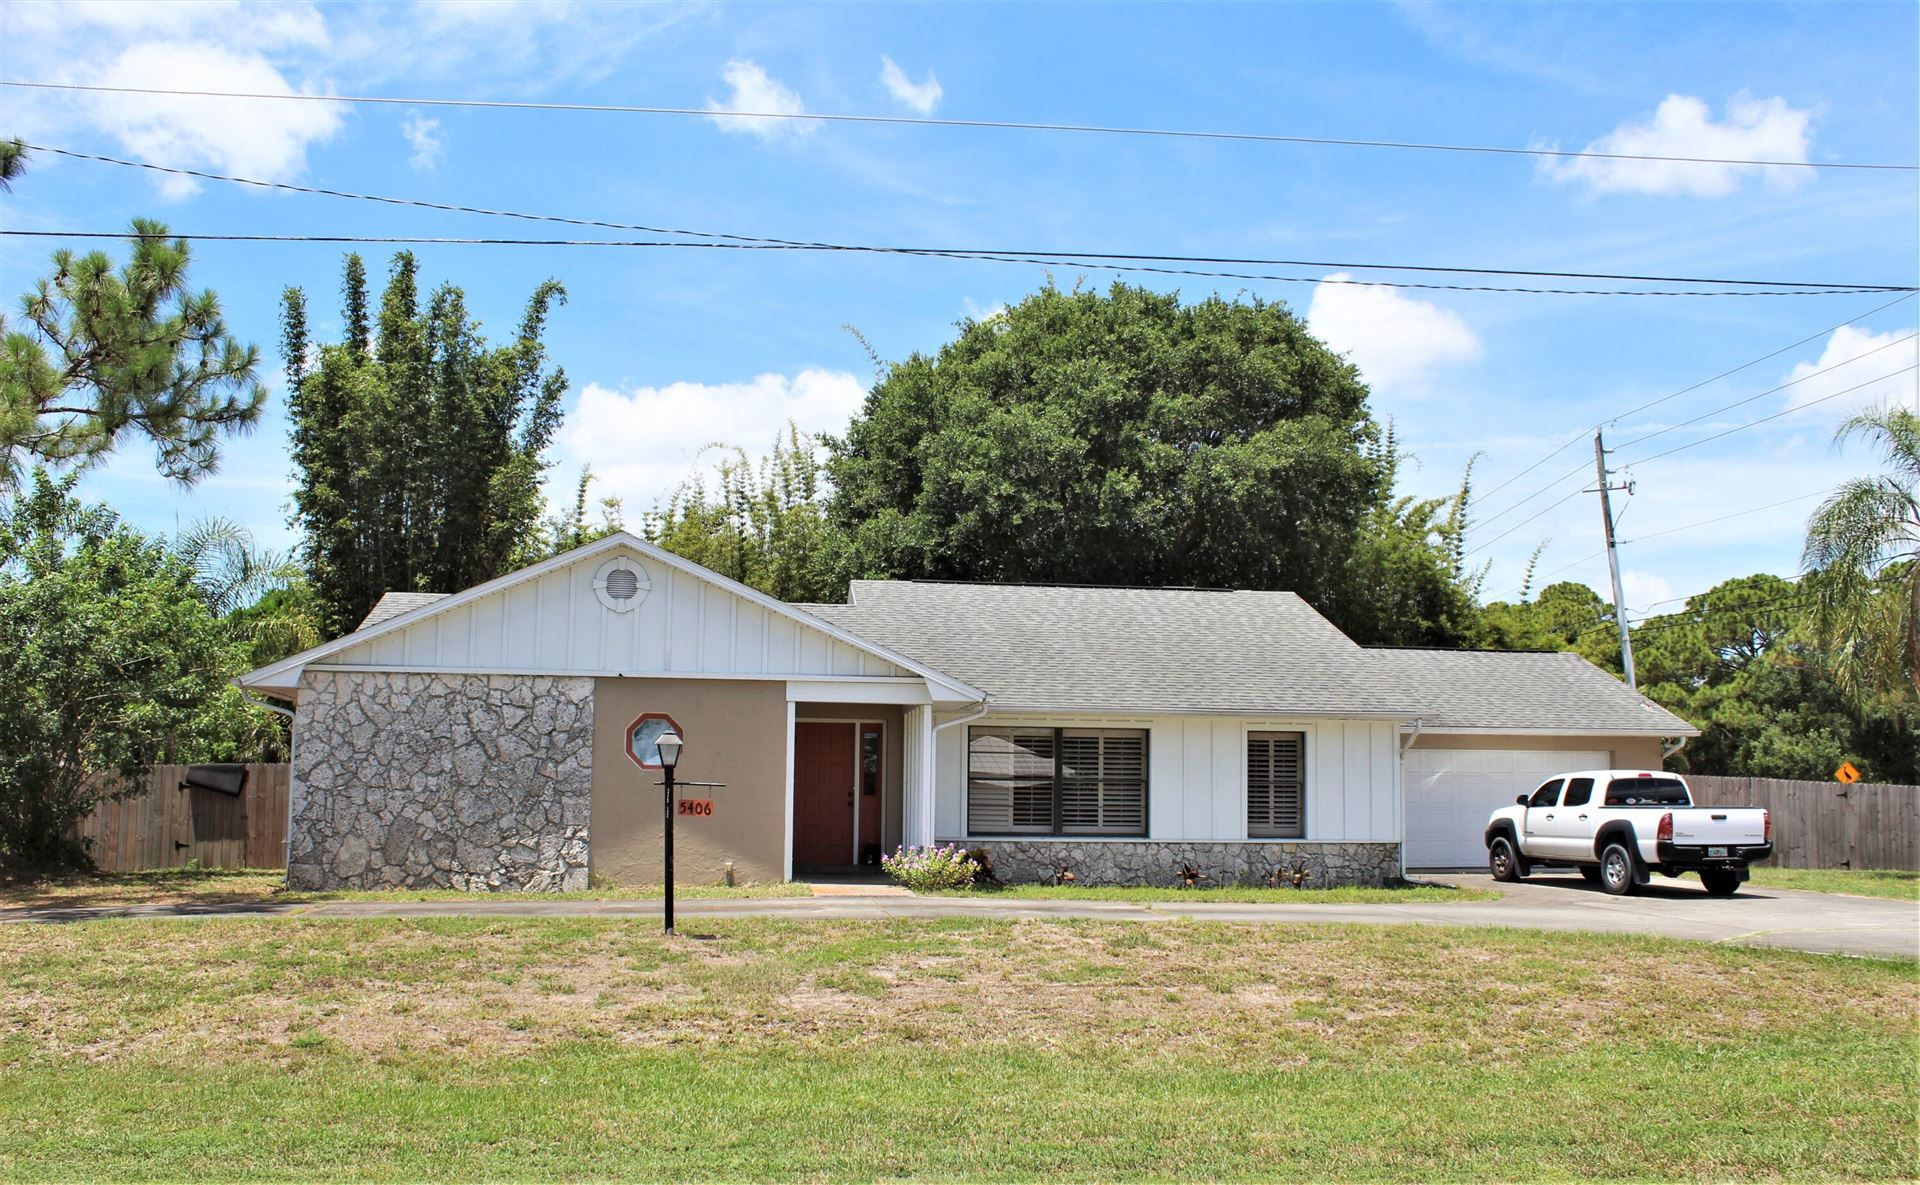 5406 Suson Lane, Fort Pierce, FL 34951 - #: RX-10723718